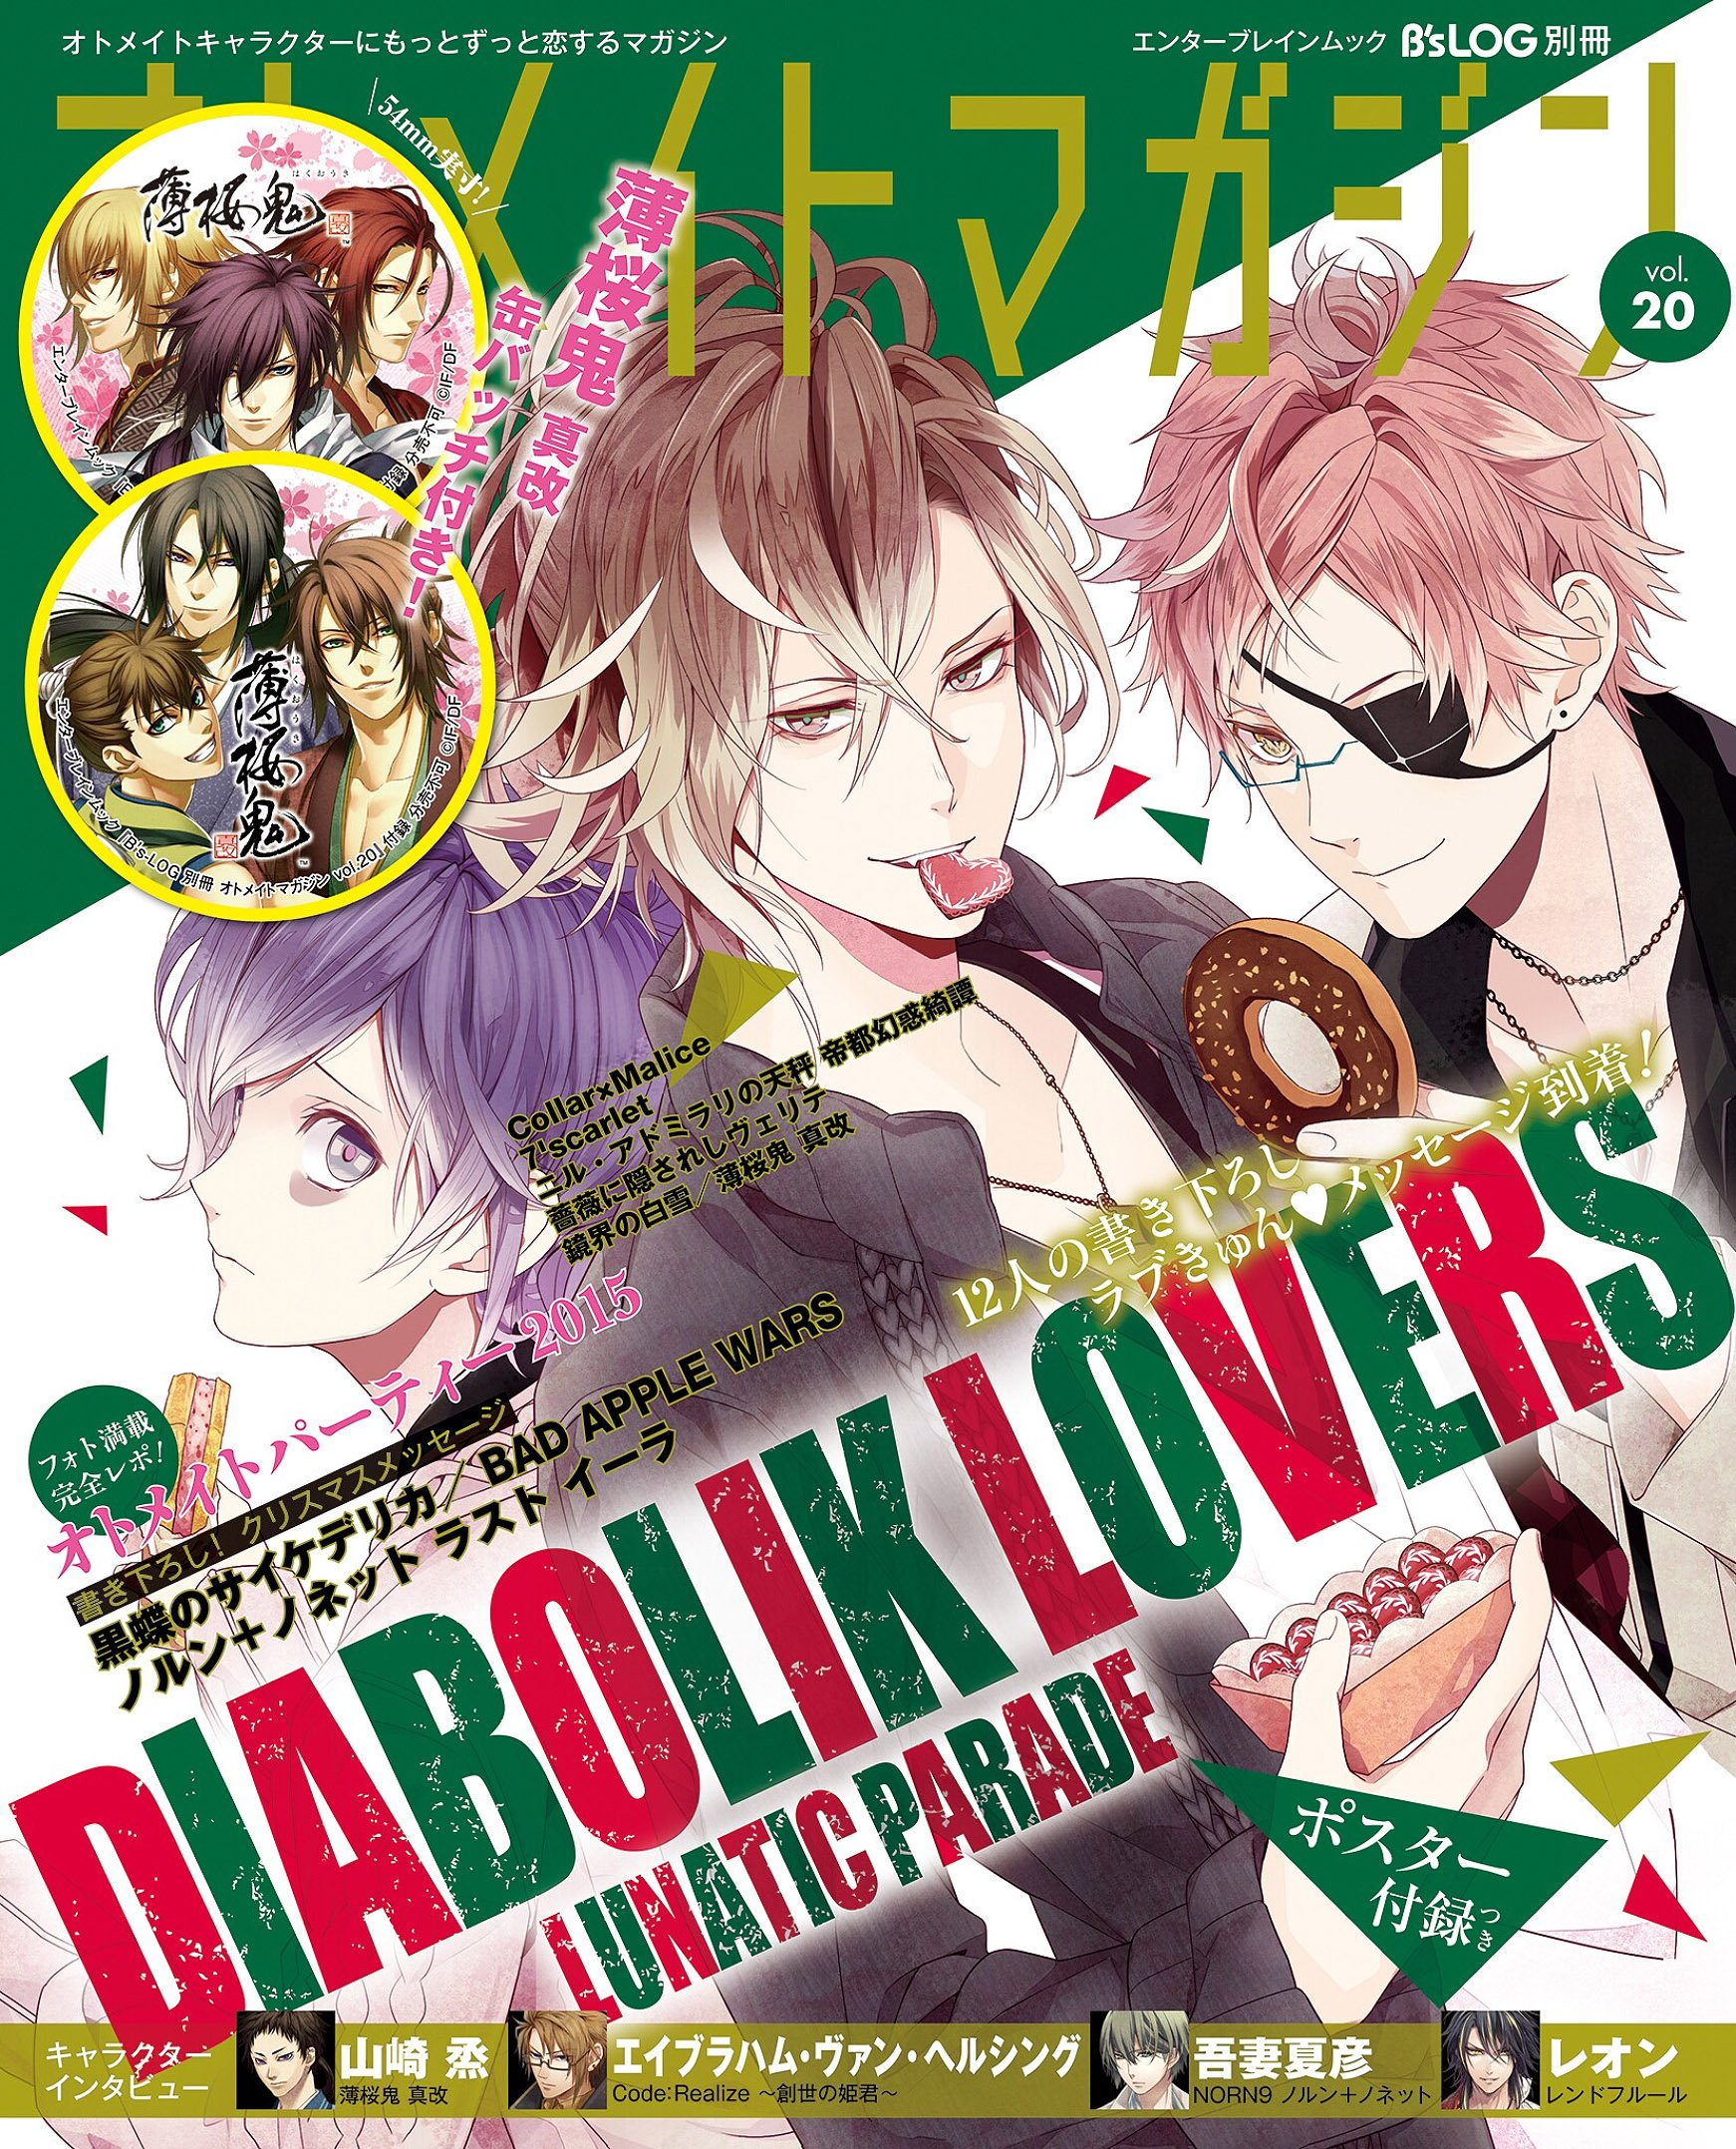 B's-LOG - Otomate Magazine Vol.20 (December 2015)